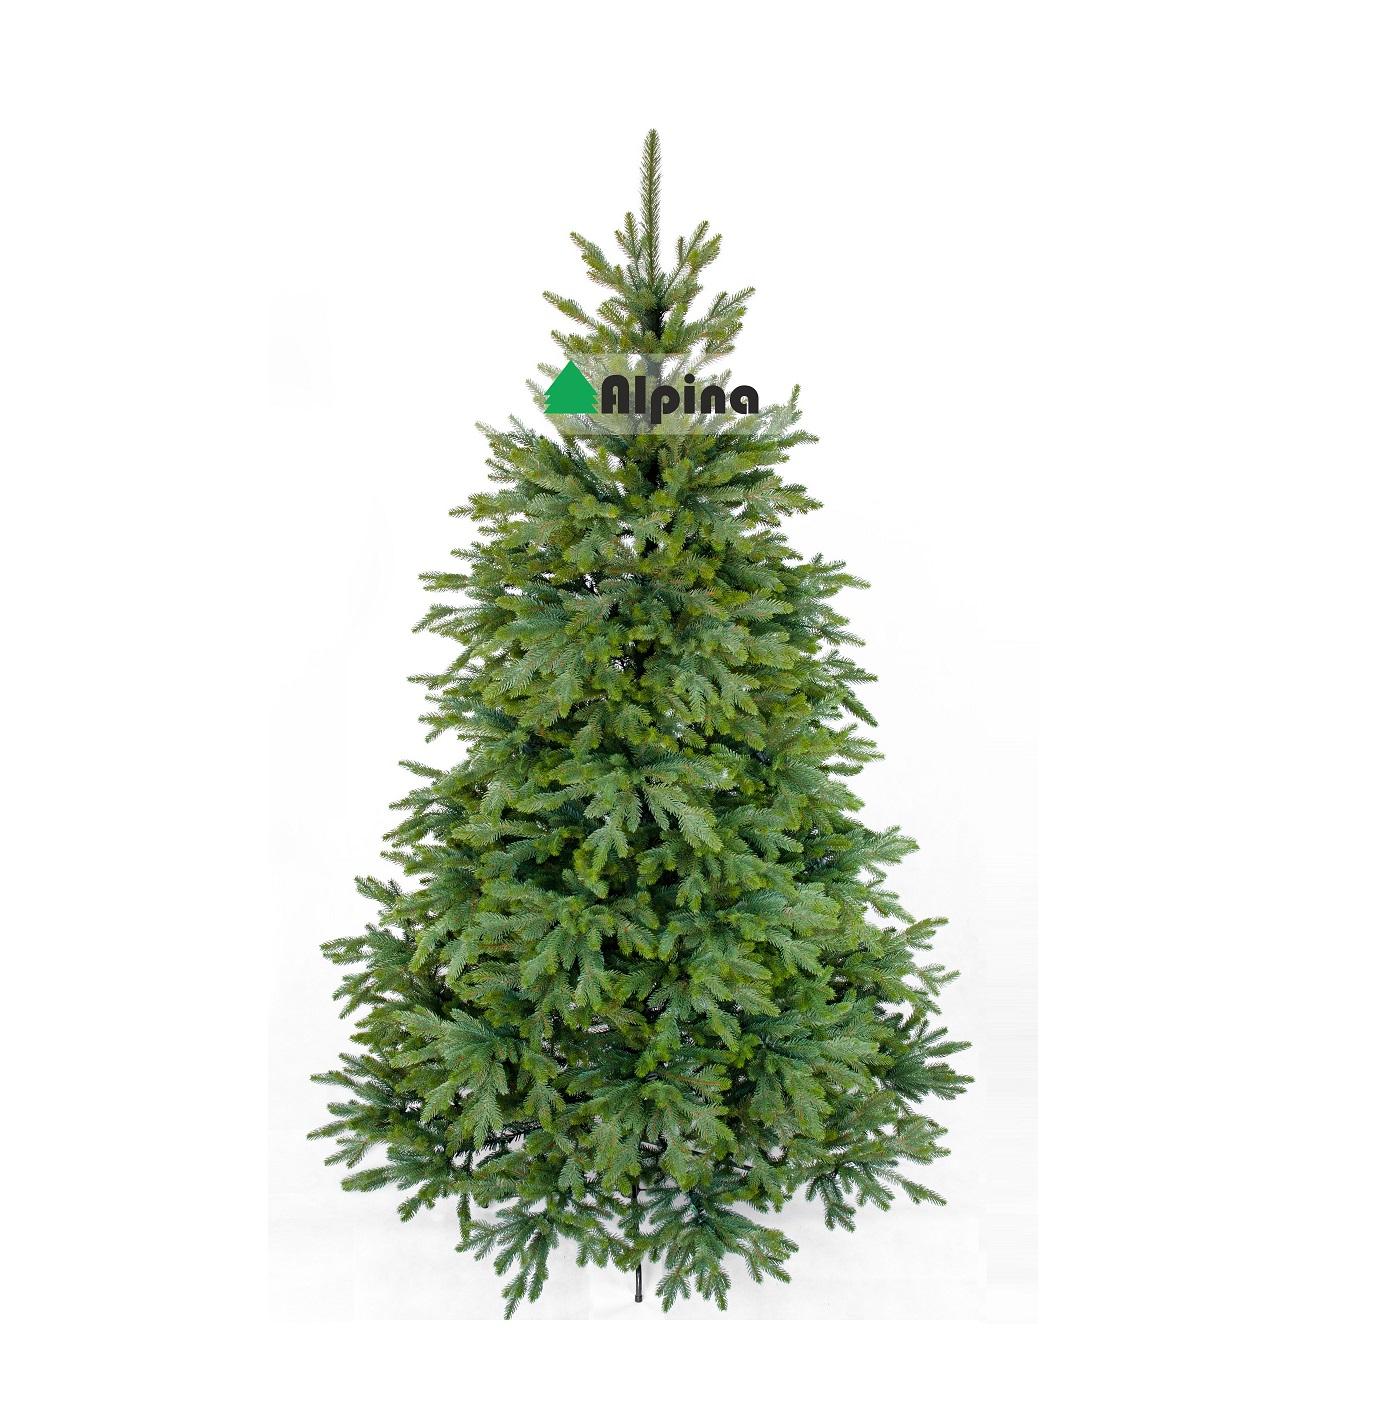 Коледна елха Alpina Смърч 100% PE 220см